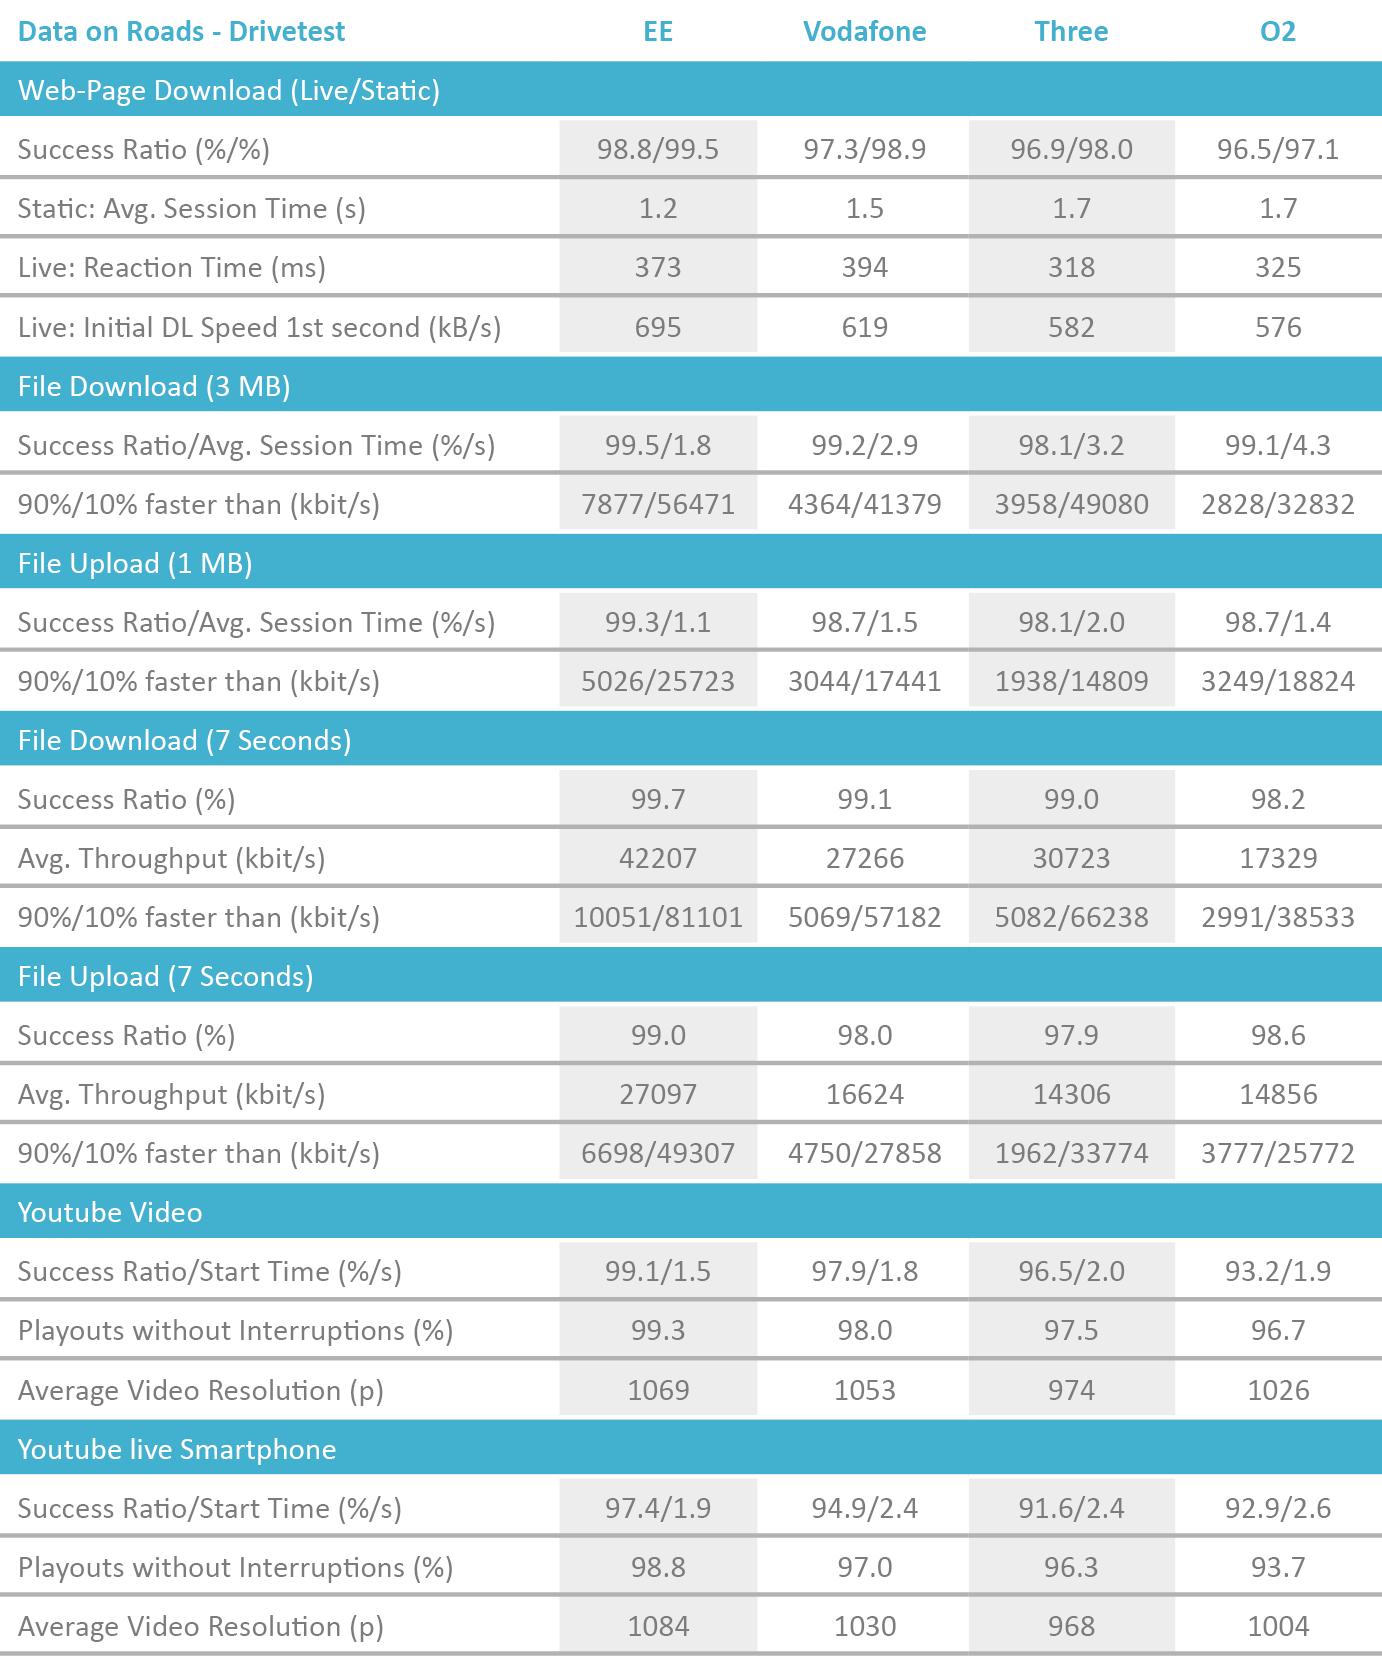 UK_Tabelle_DataRoads_Drivetest_2018_englisch_v2.png